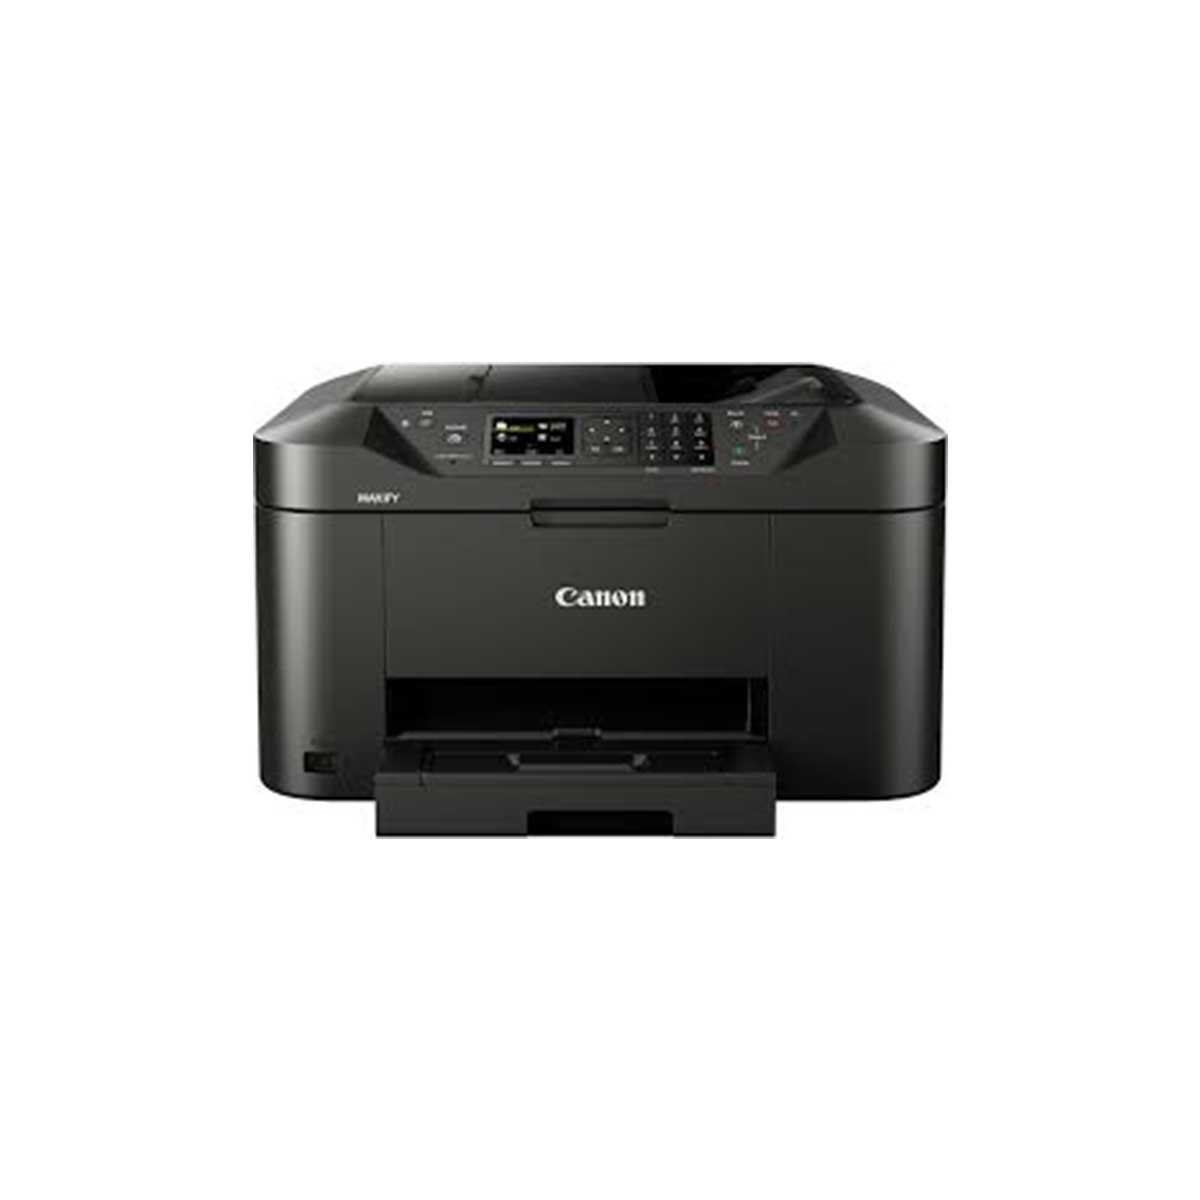 Canon Maxify MB2155 A4 Multifunction Inkjet printer